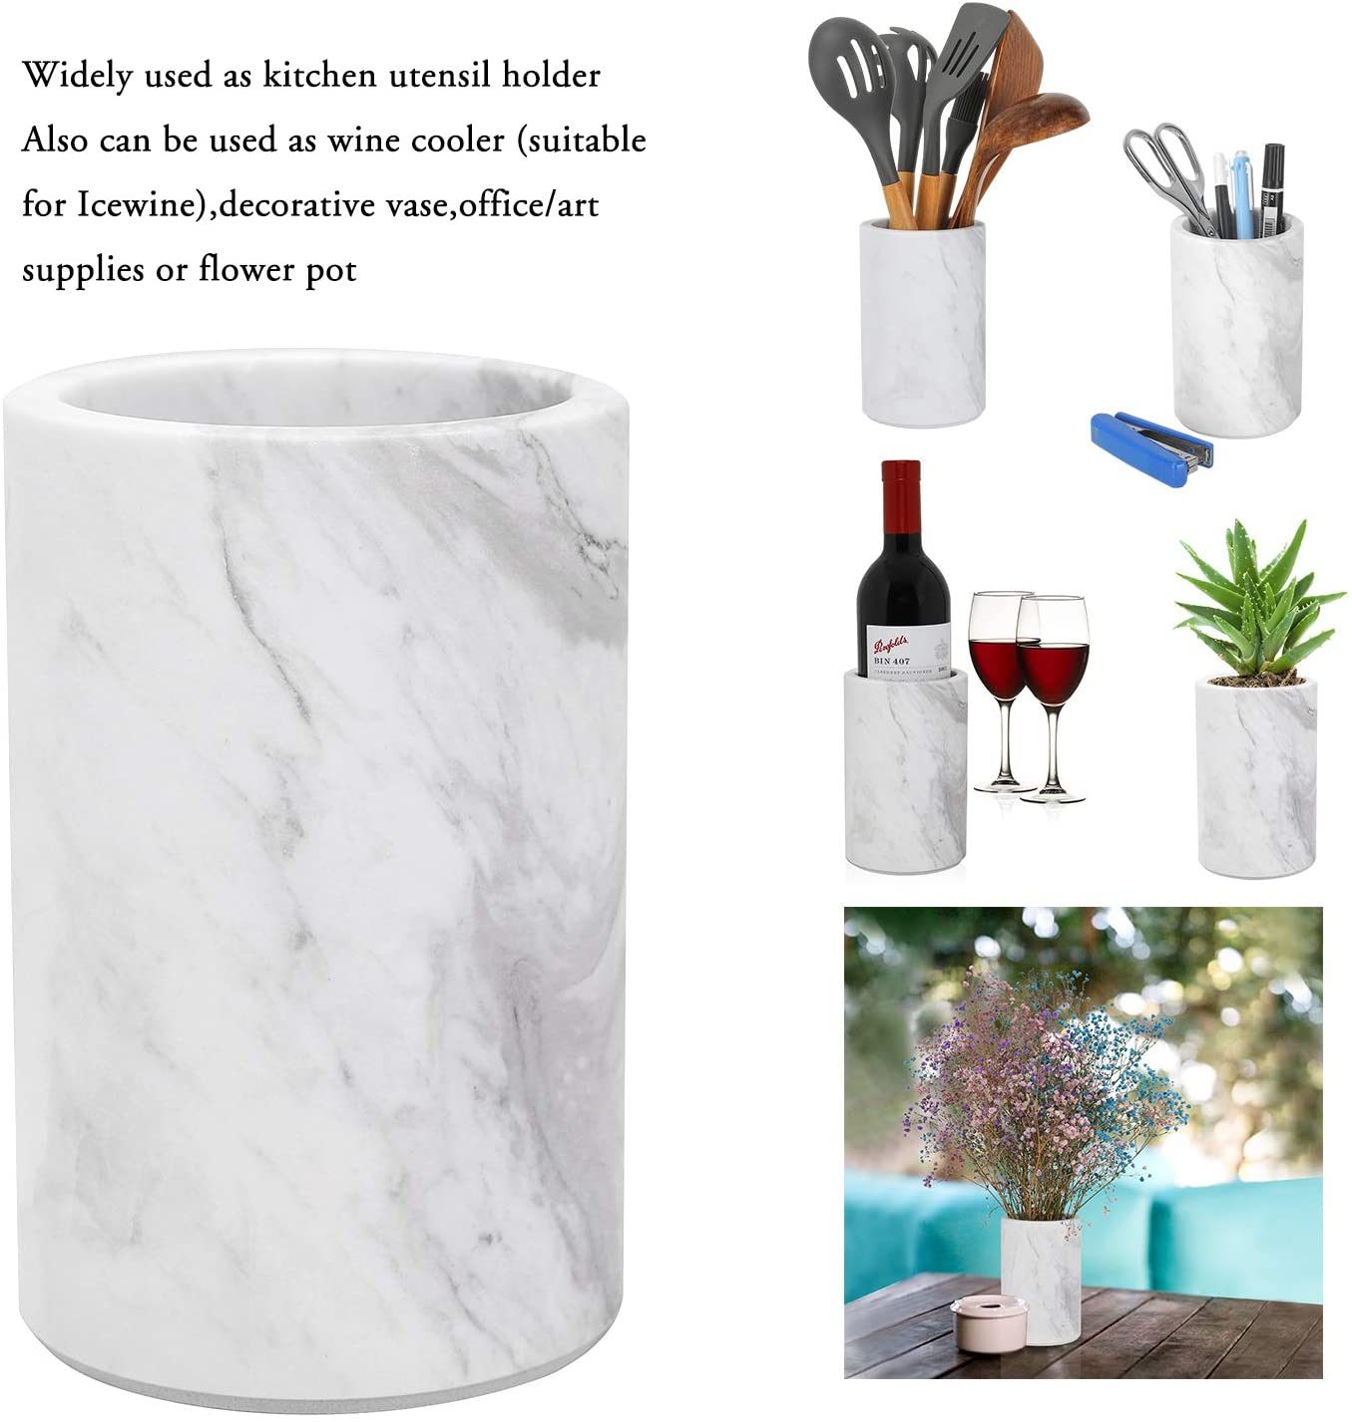 Utensil Holder Straws Fits Champagne Bottle Marble Crock by KooK Flowers